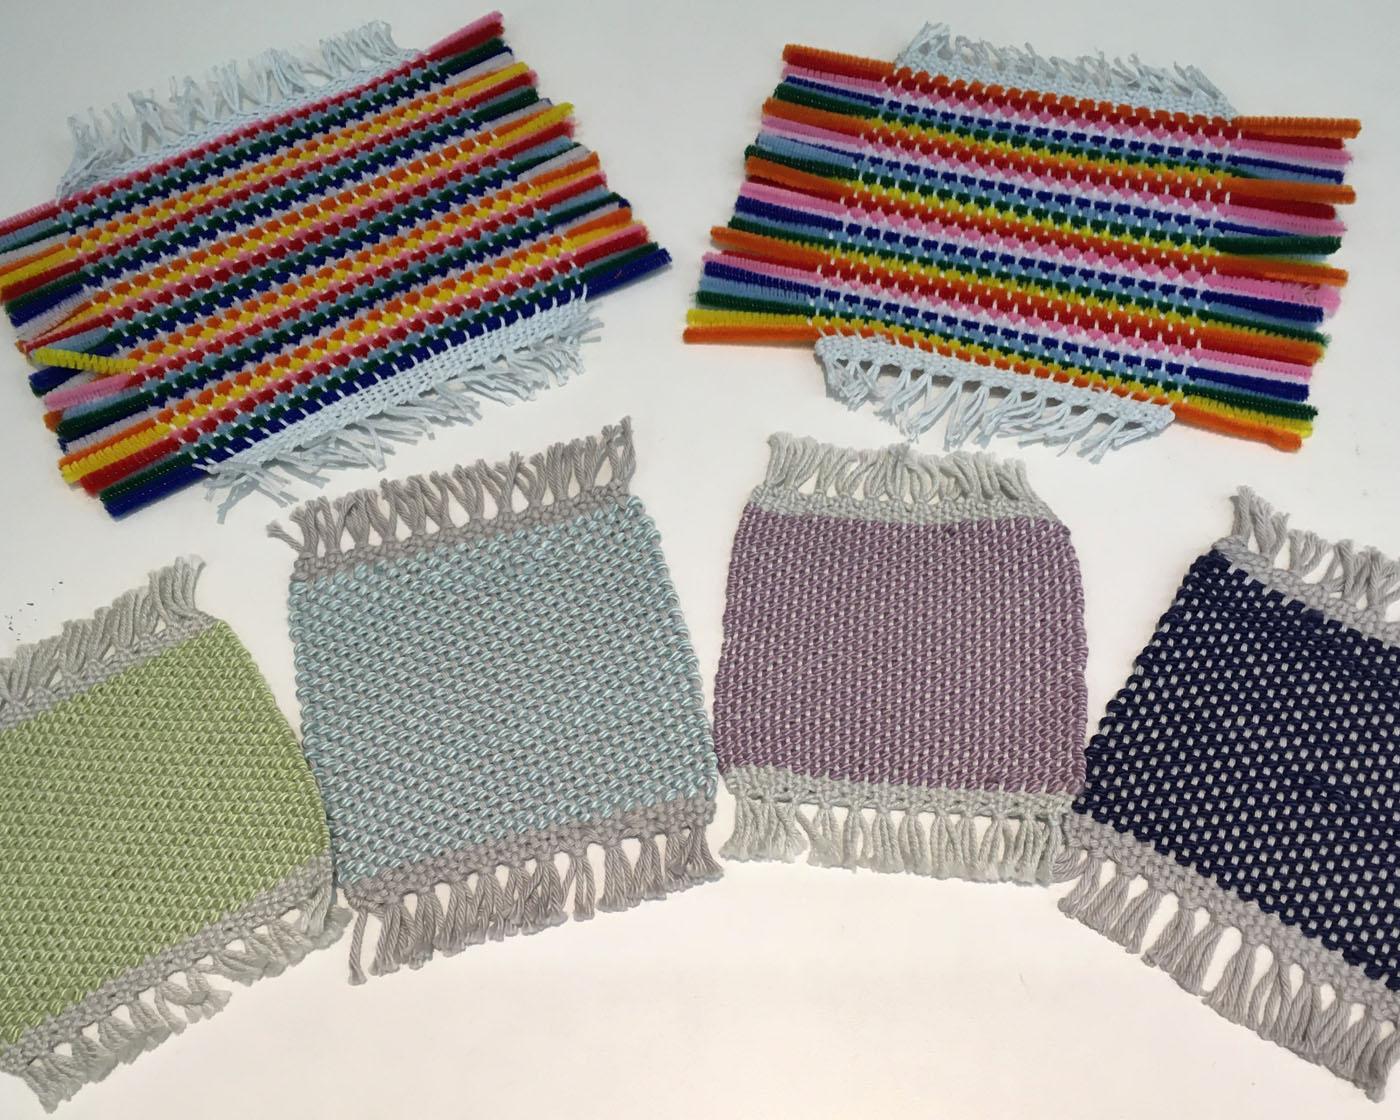 Coaster weaving